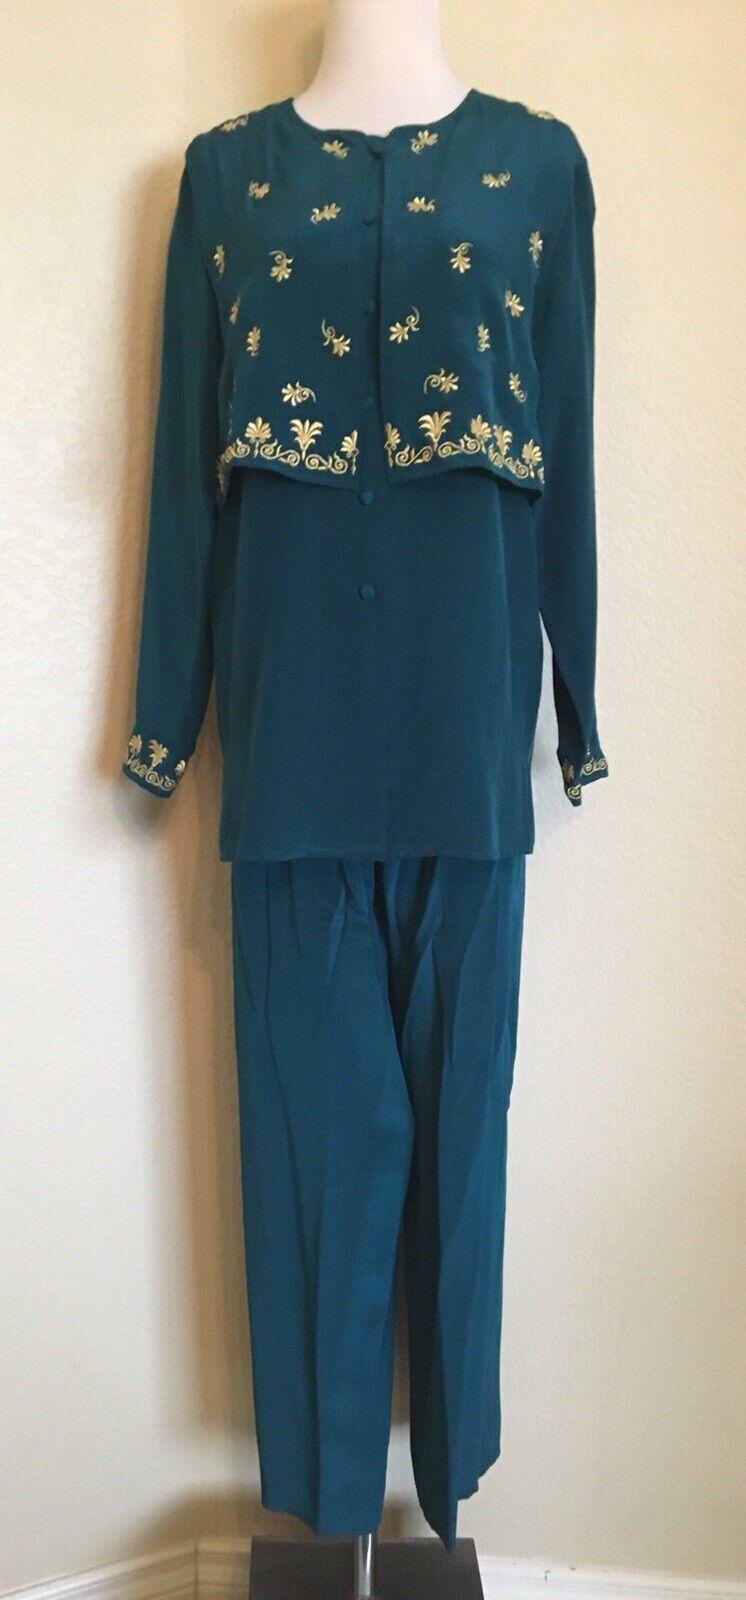 Diane Von Furstenberg årgång Silk Embroideröd Tunic Top Pantsuit Storlek XS ny